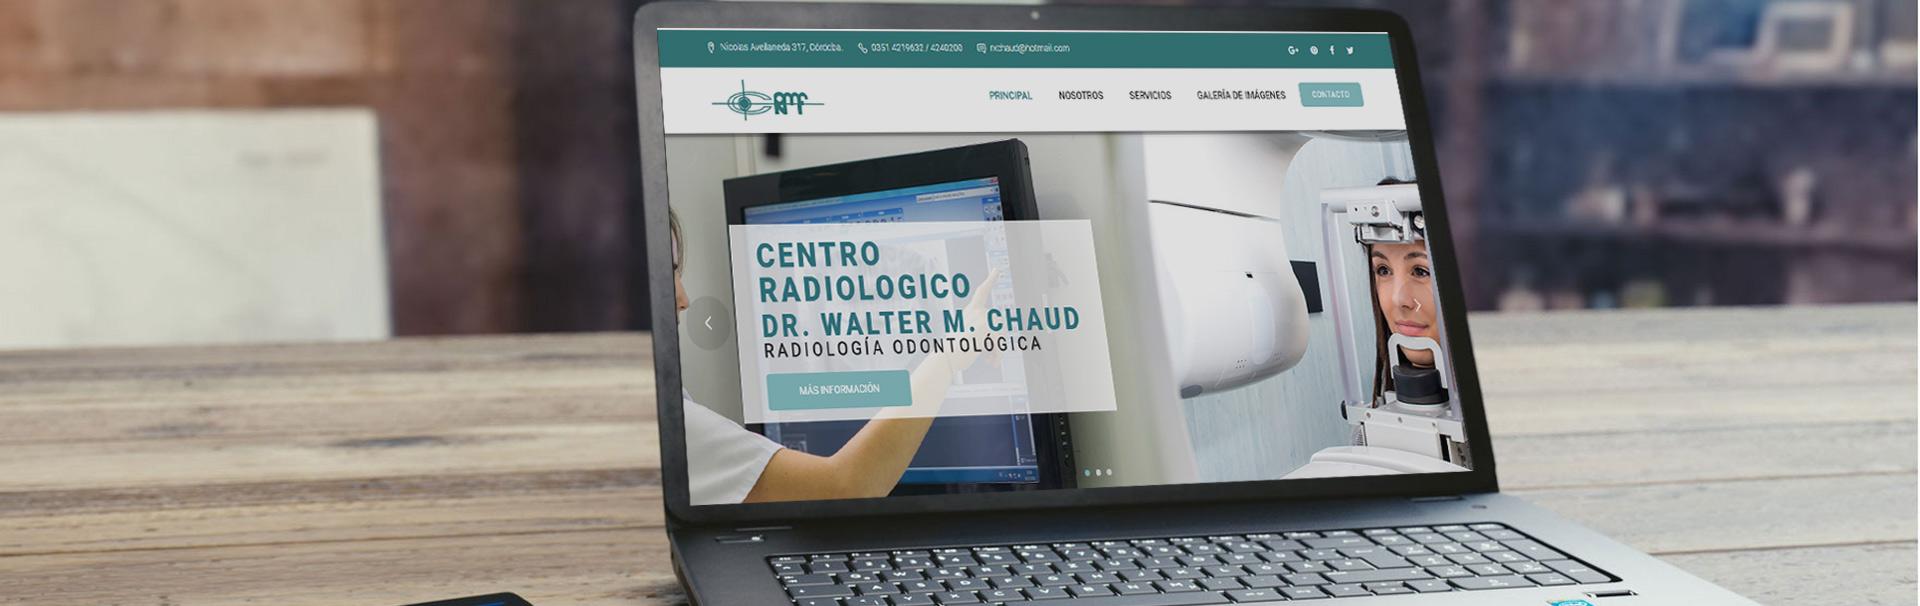 Centro Radiológico. Chaud